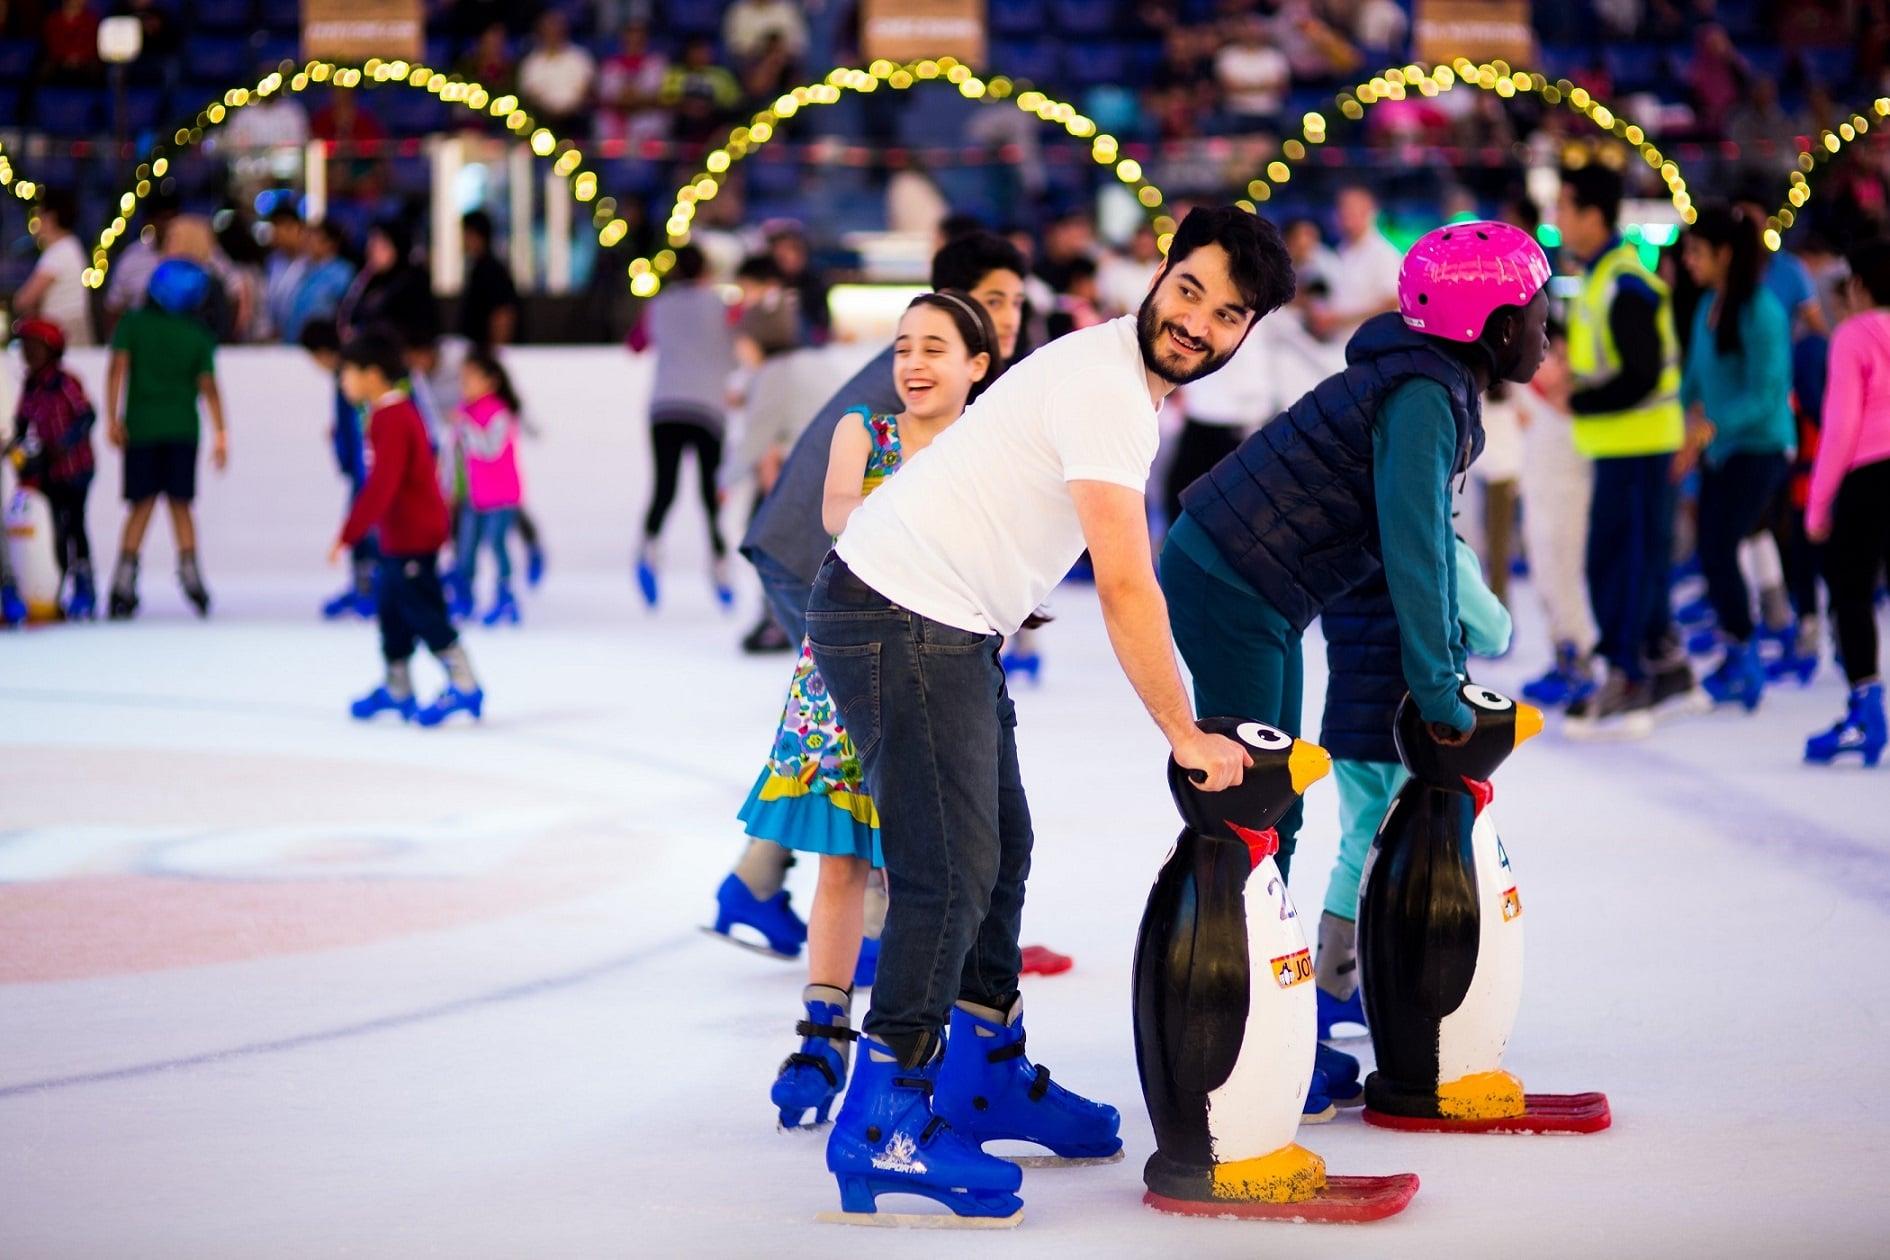 Where can I learn Figure Skating in Dubai? | Yahoo Answers